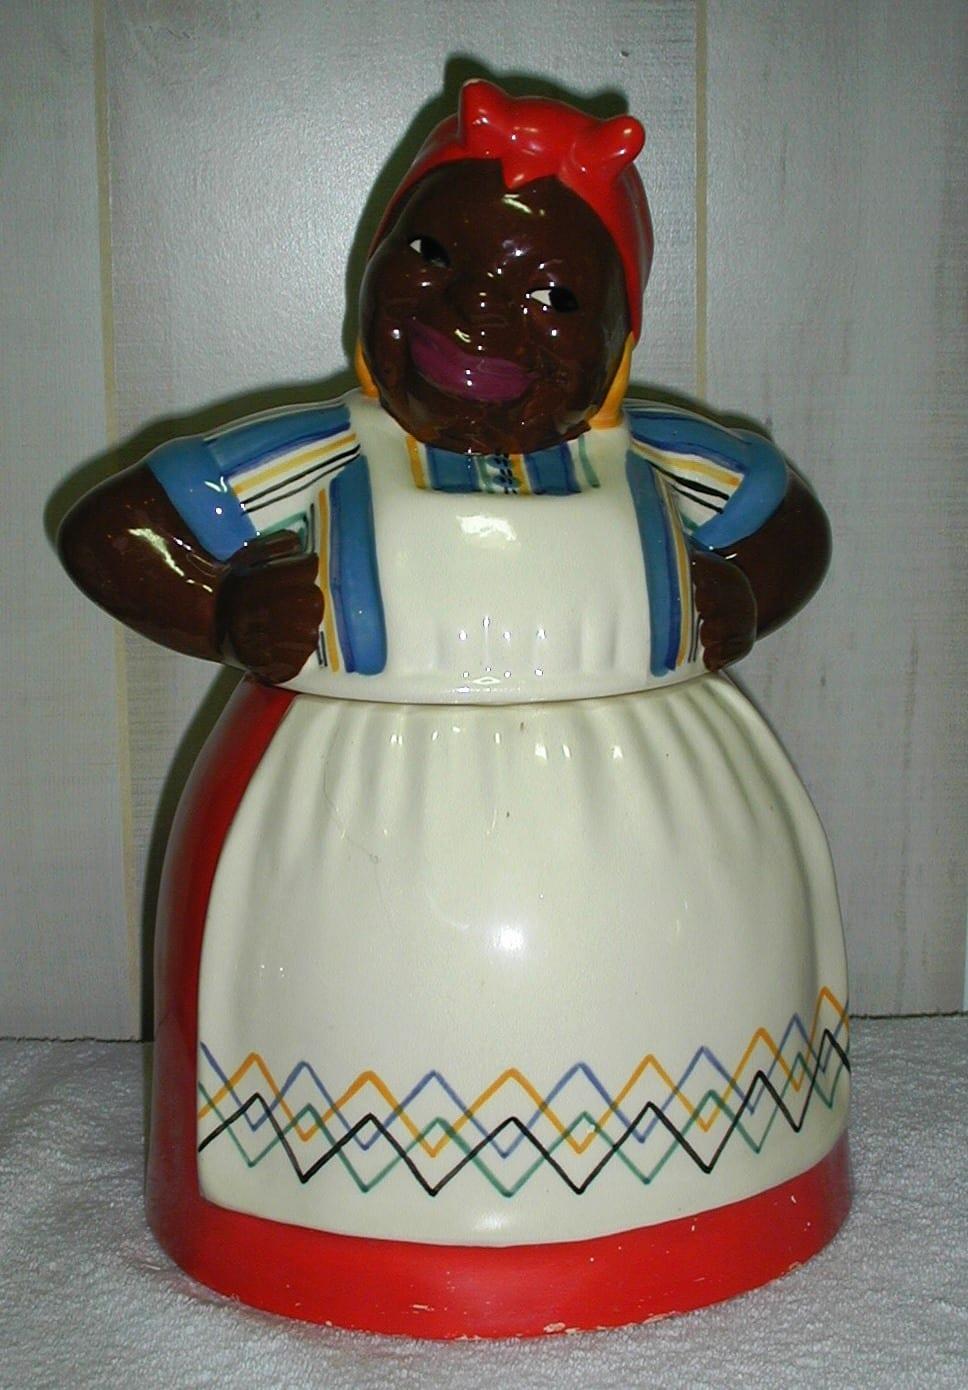 Mammy By Brayton Laguna Collector Cookie Jar – Collector Cookie Jars